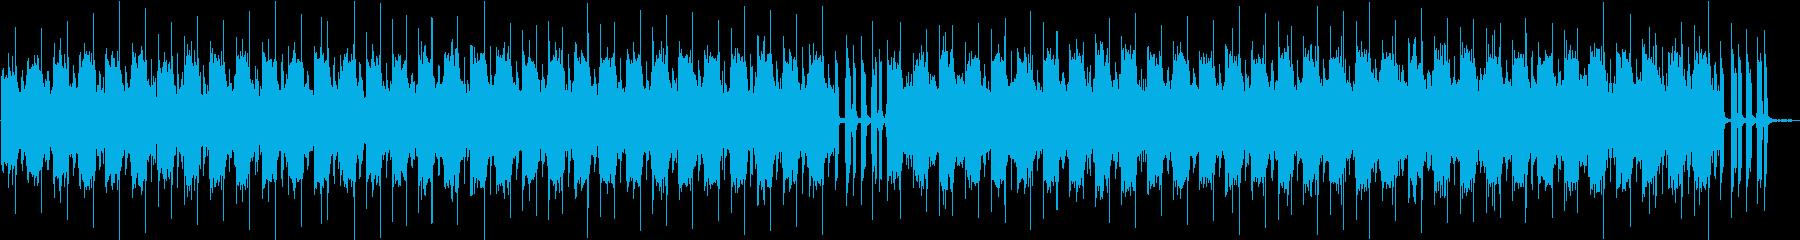 Chill Music レゲエ、ダブ風味の再生済みの波形